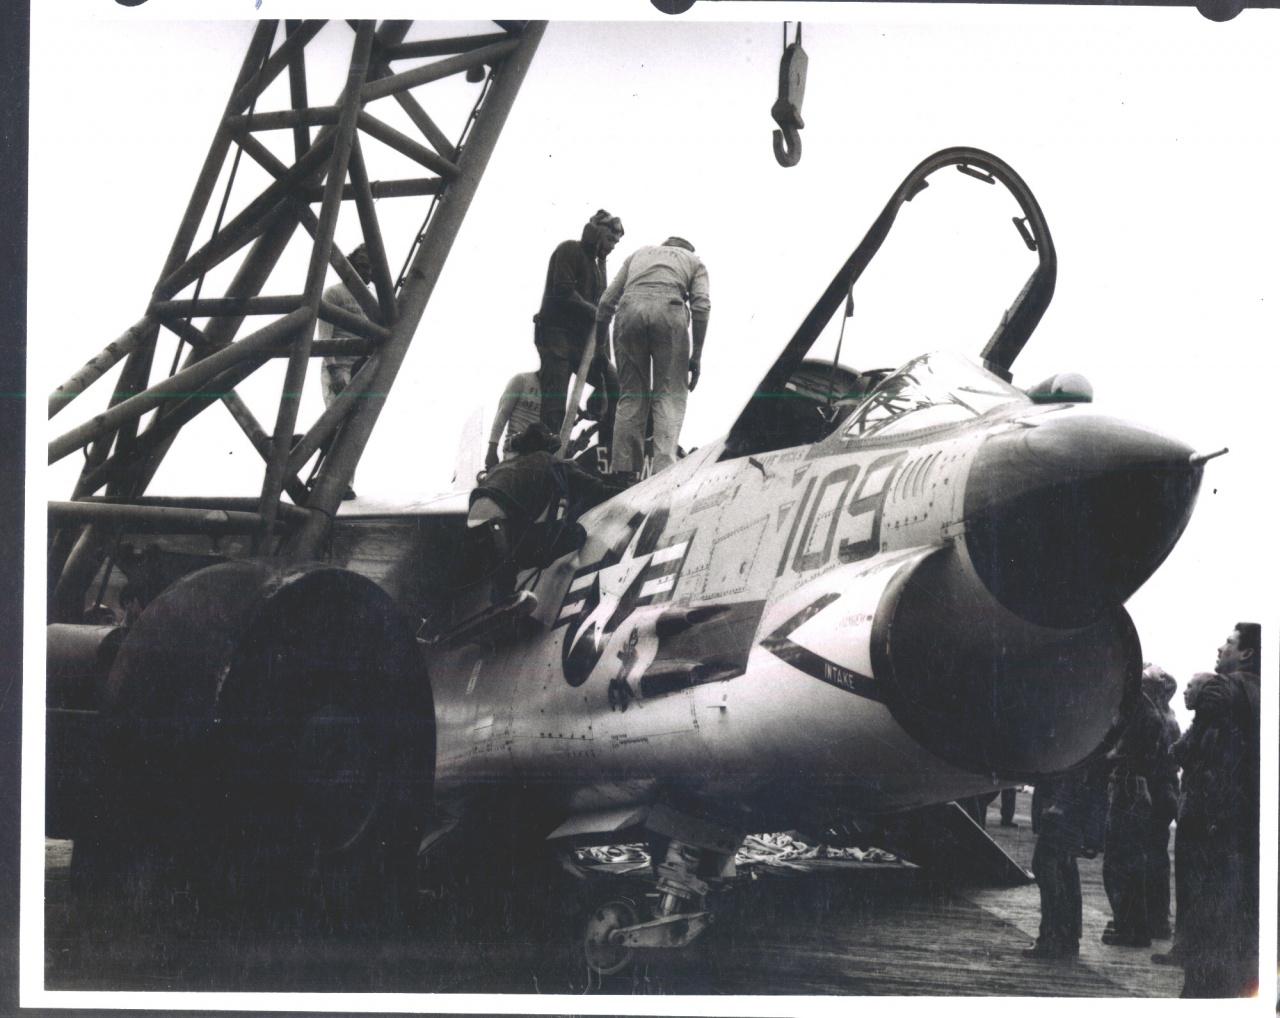 Oriskany Souvenir-military-1955-1968074-2-jpg